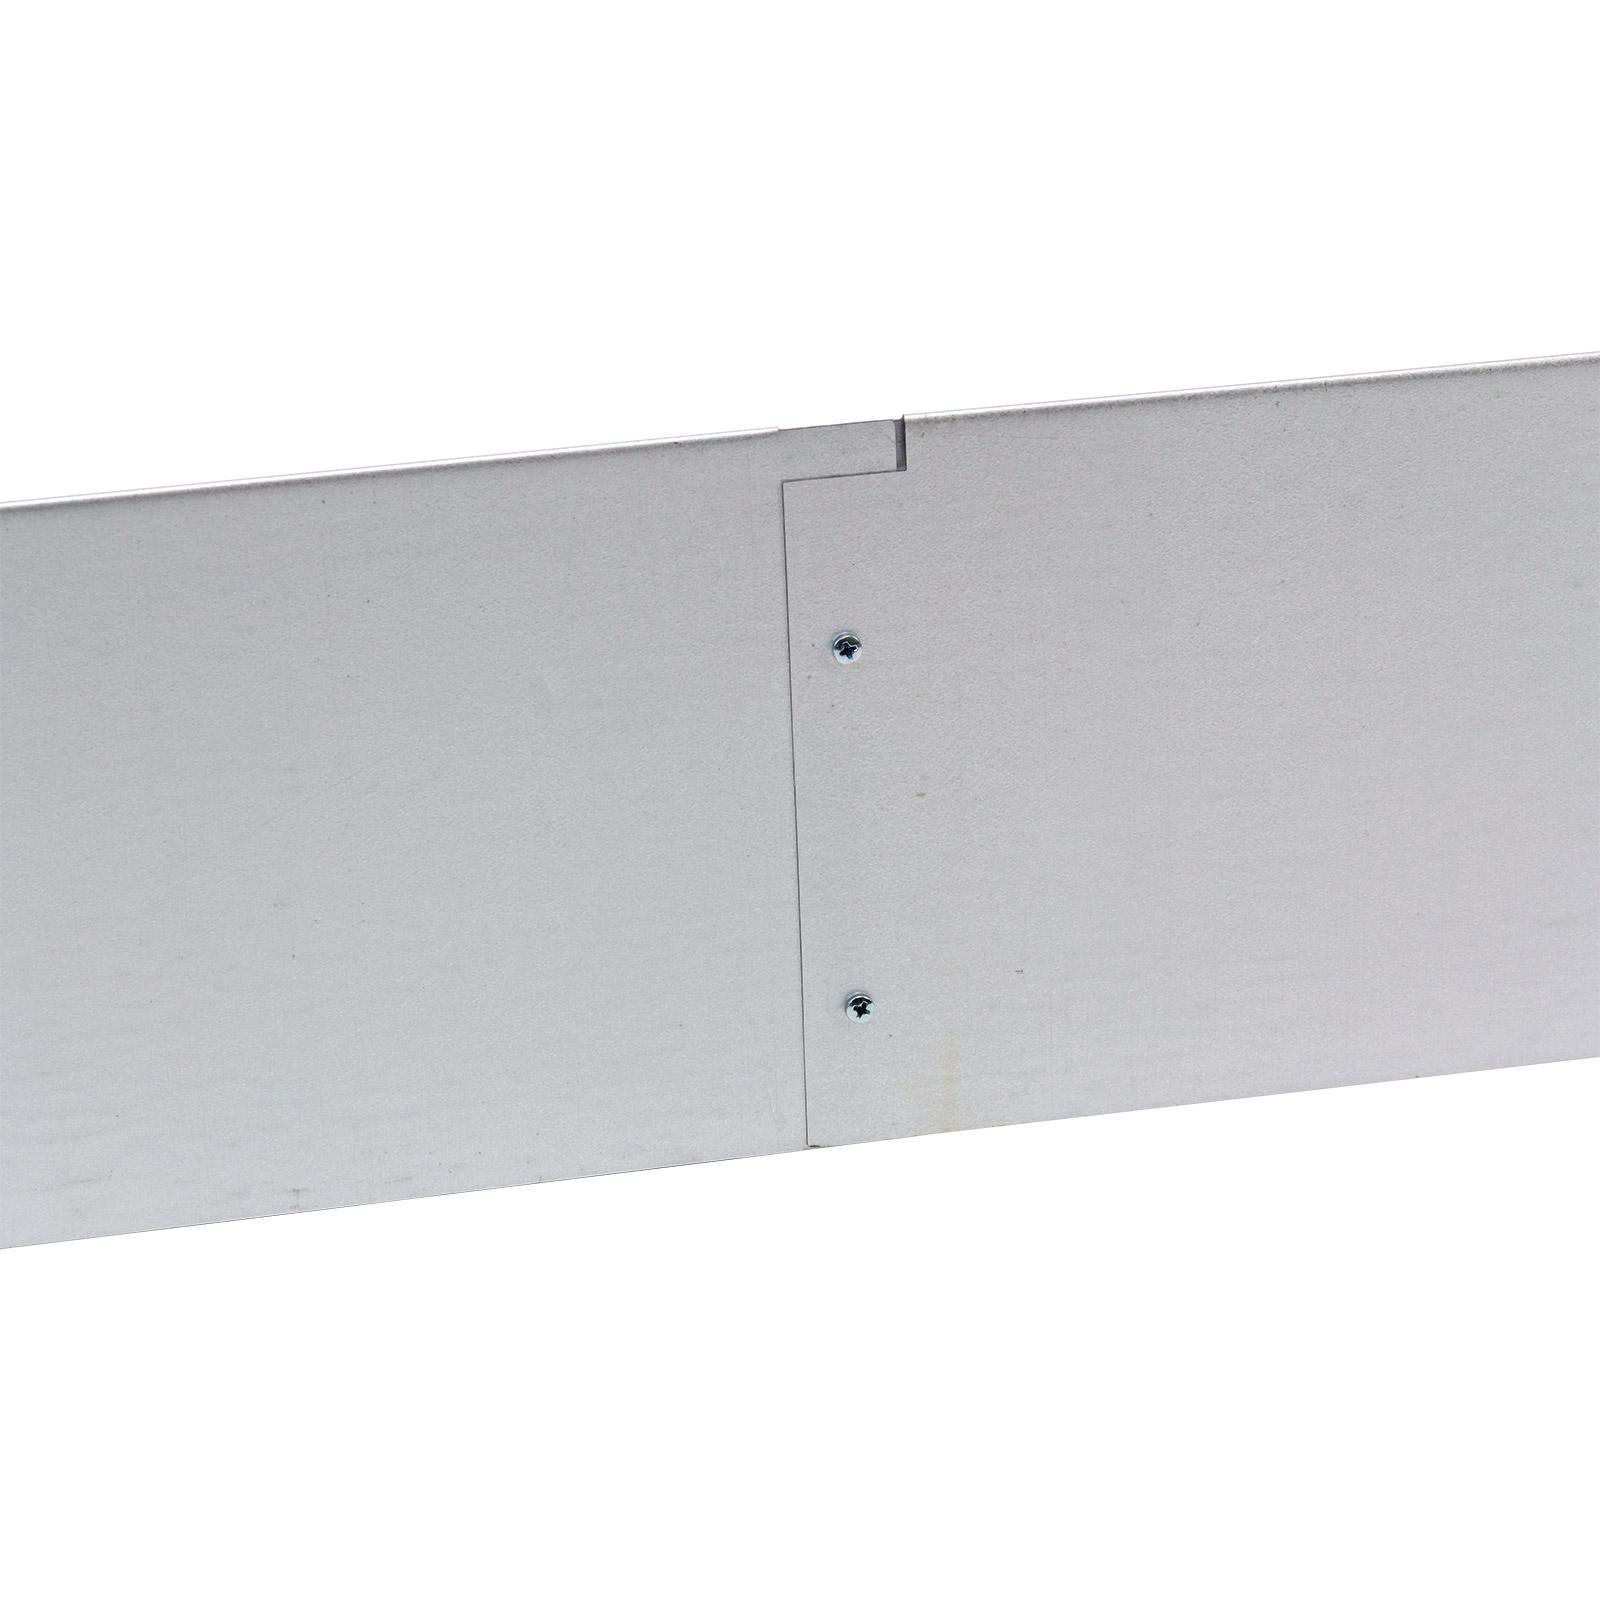 Metall Rasenkante 10er Set 118x13 cm mit hochwertiger Alu-Verzinkung